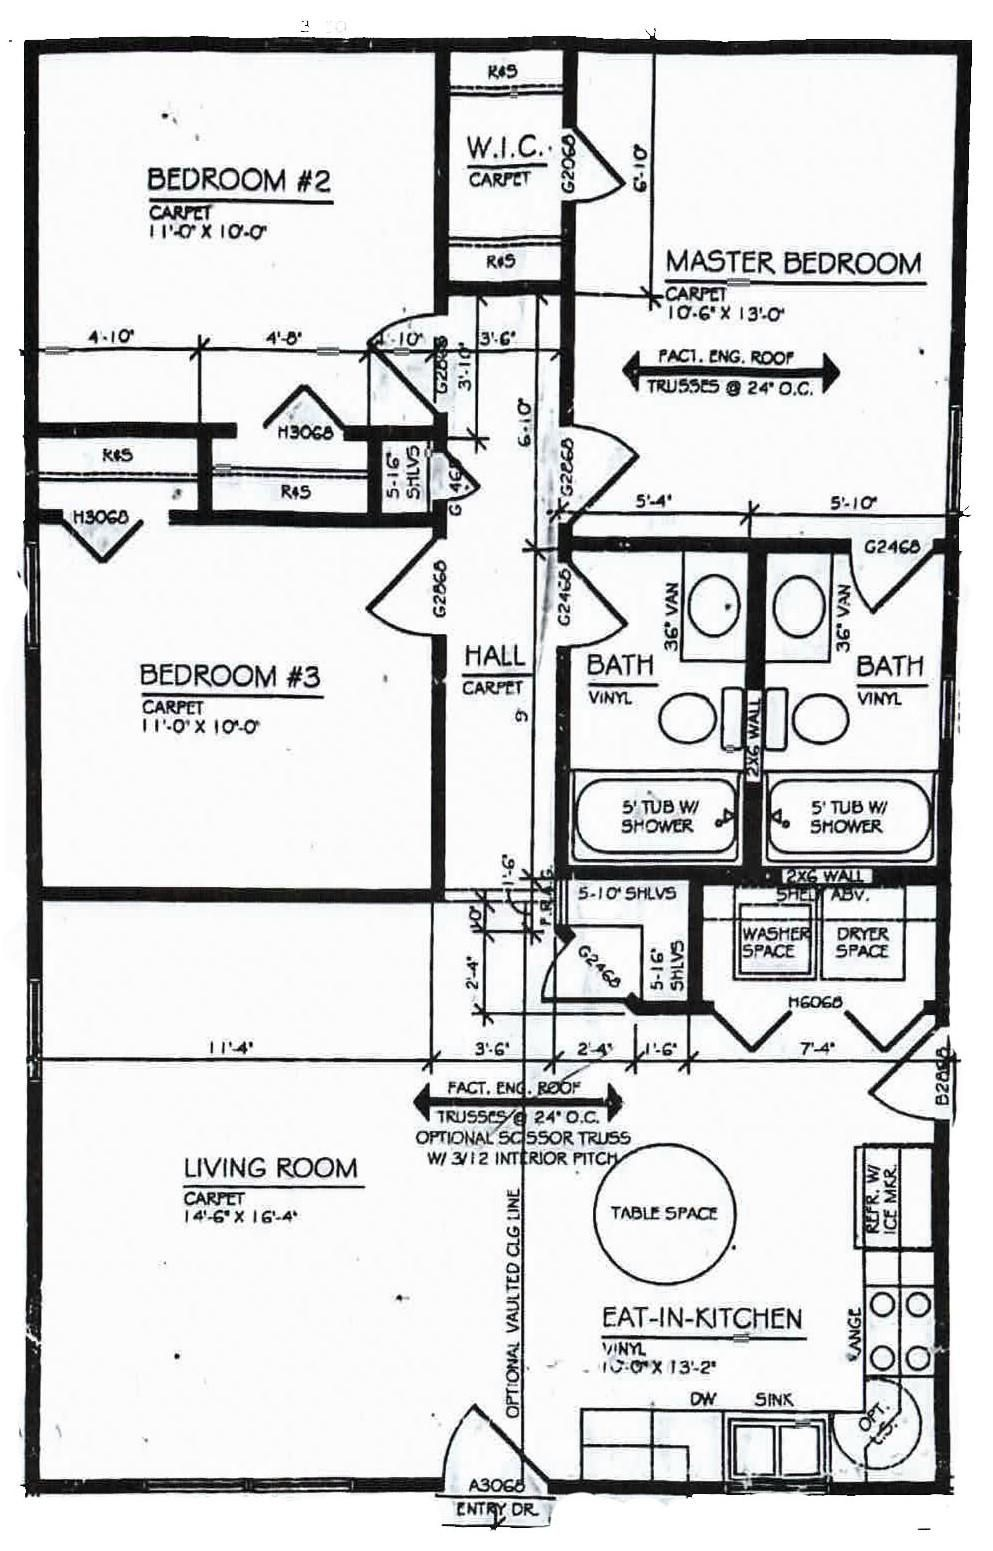 The Edison floor plan flyers